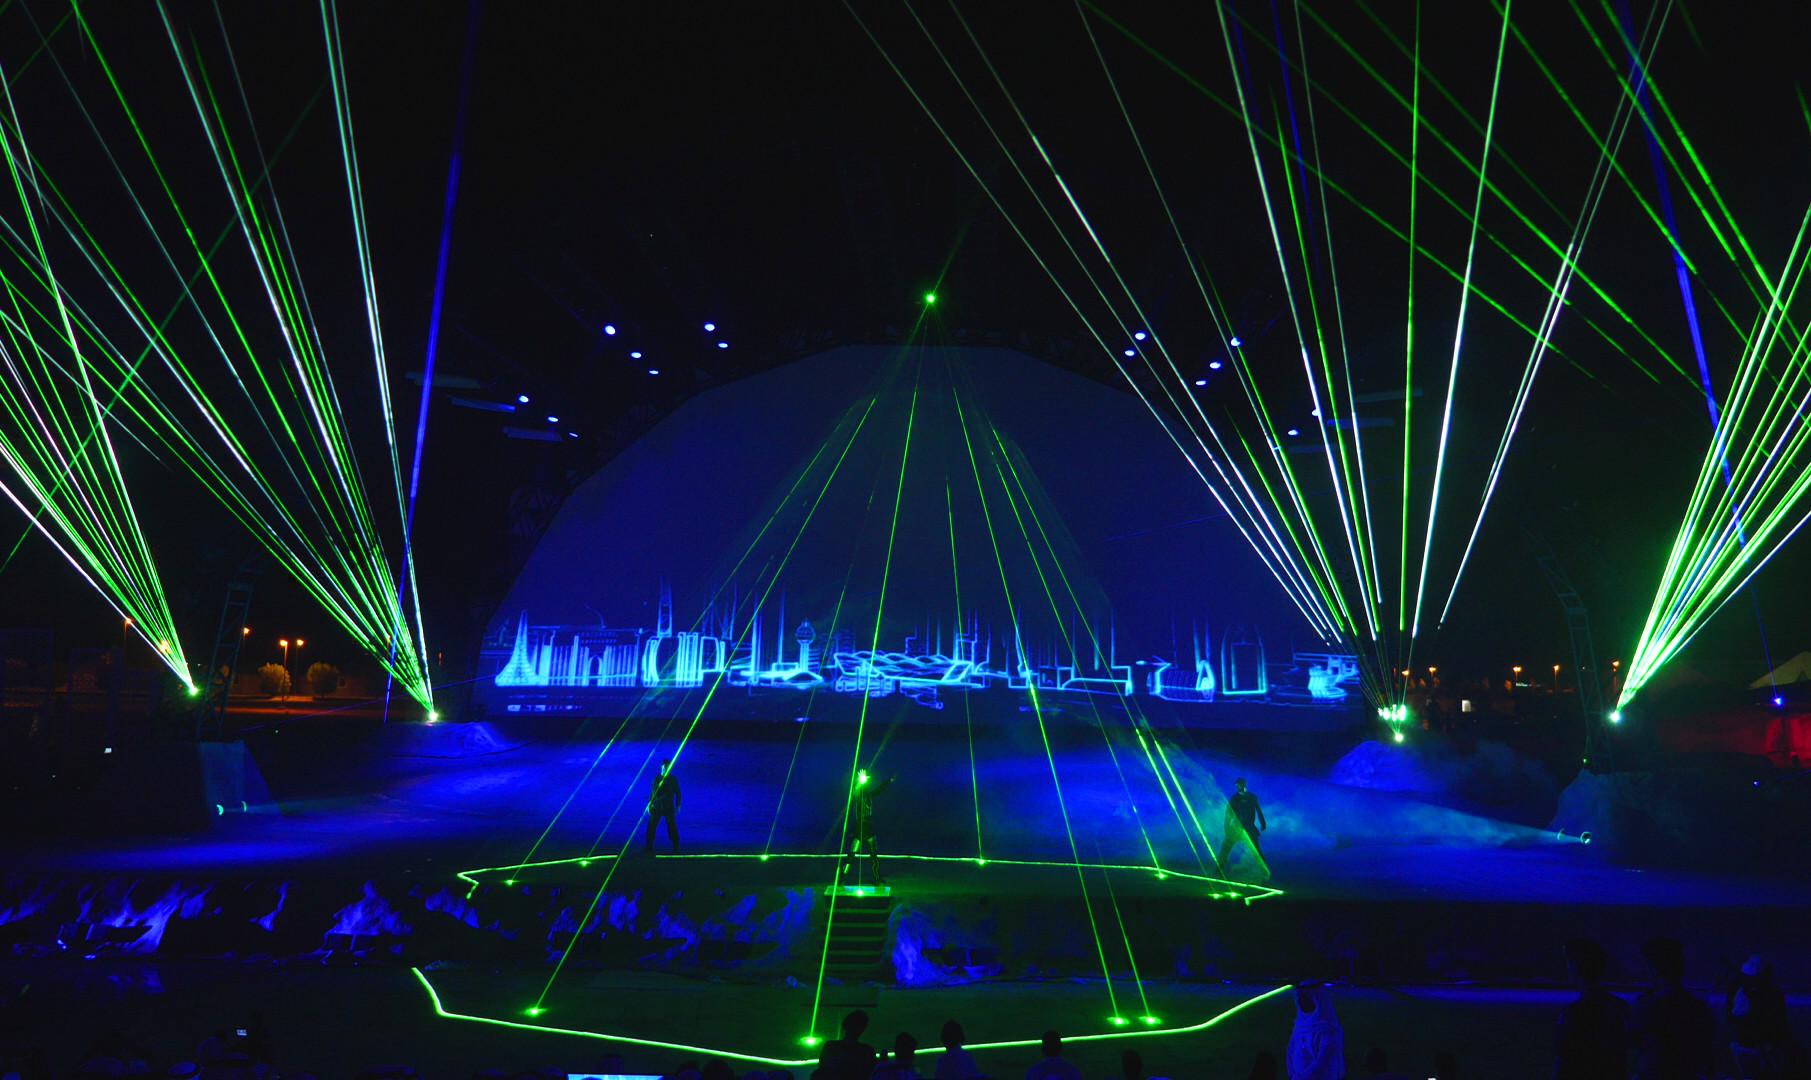 Ultimate Laserman_OKAZ2_240p